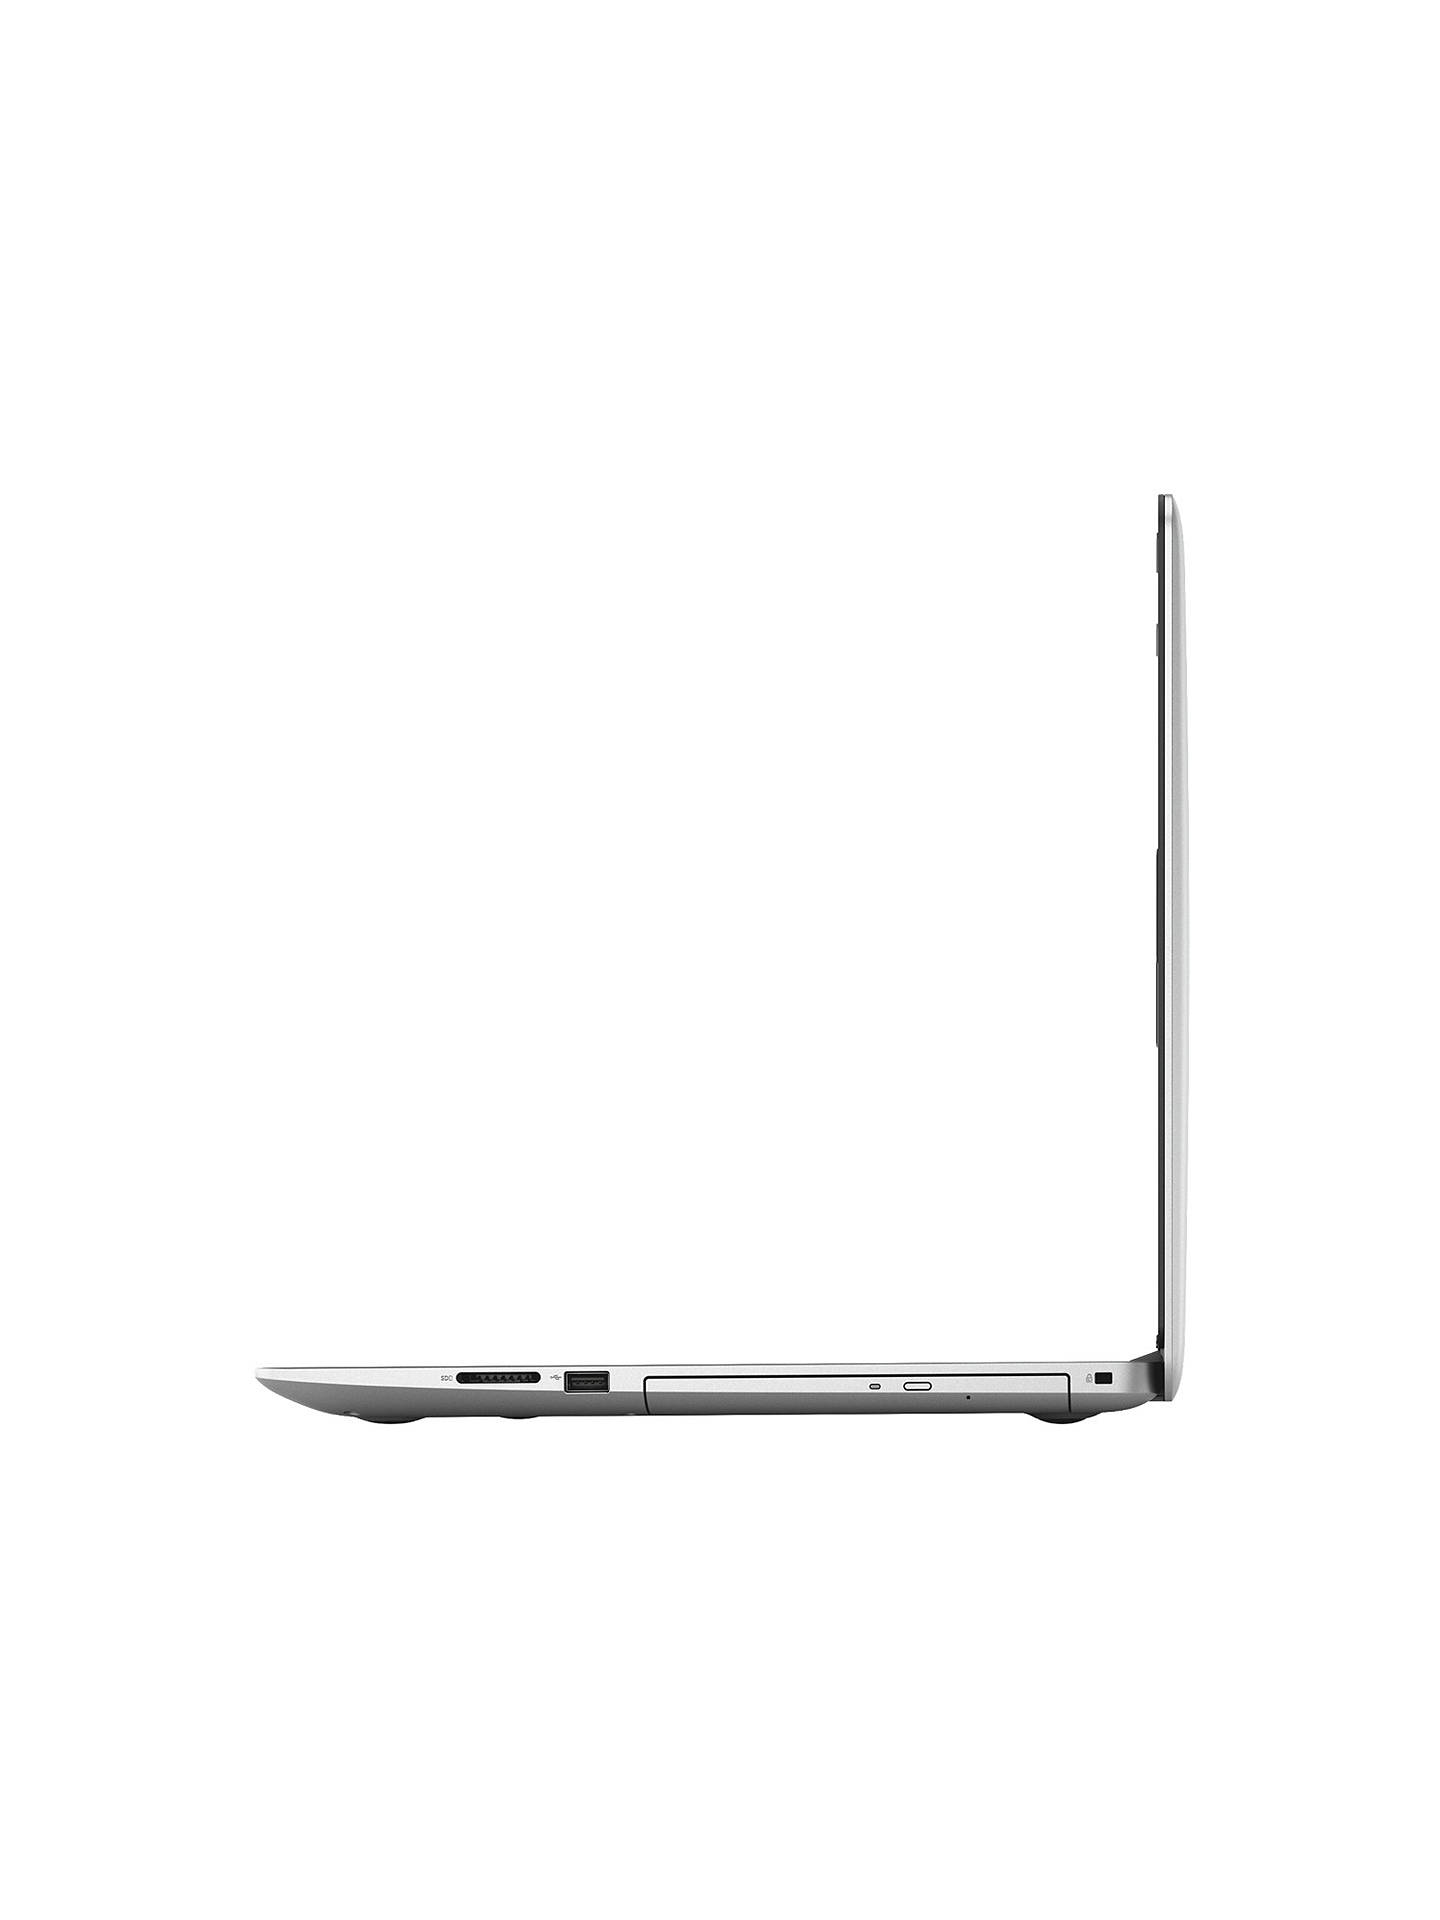 Dell Inspiron 17-5770 Laptop, Intel® Core™ i5, 8GB RAM, AMD Radeon, 1TB HDD  + 128GB SSD, 17 3